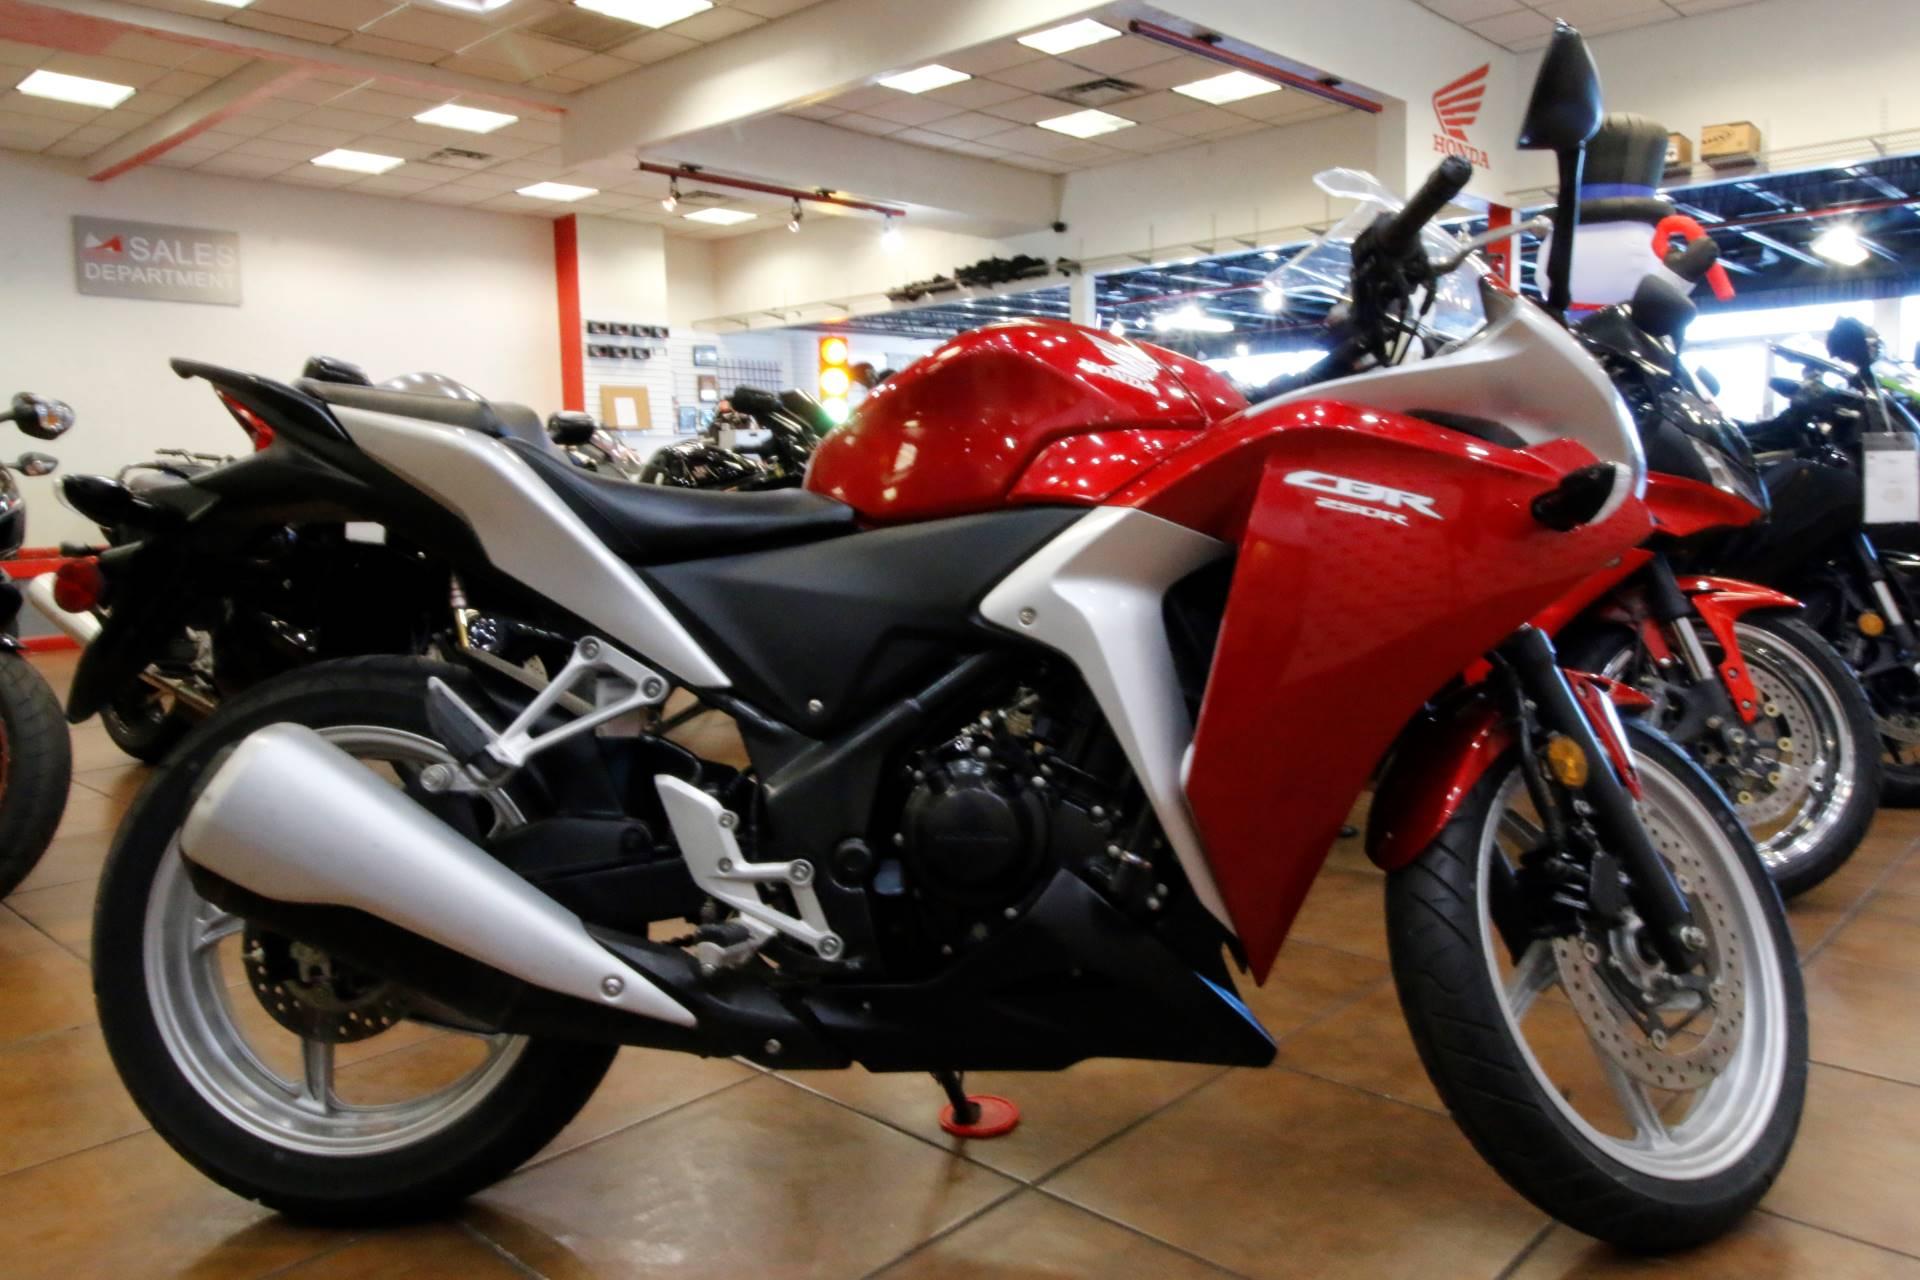 Used 2012 Honda Cbr250r Motorcycles In Pinellas Park Fl